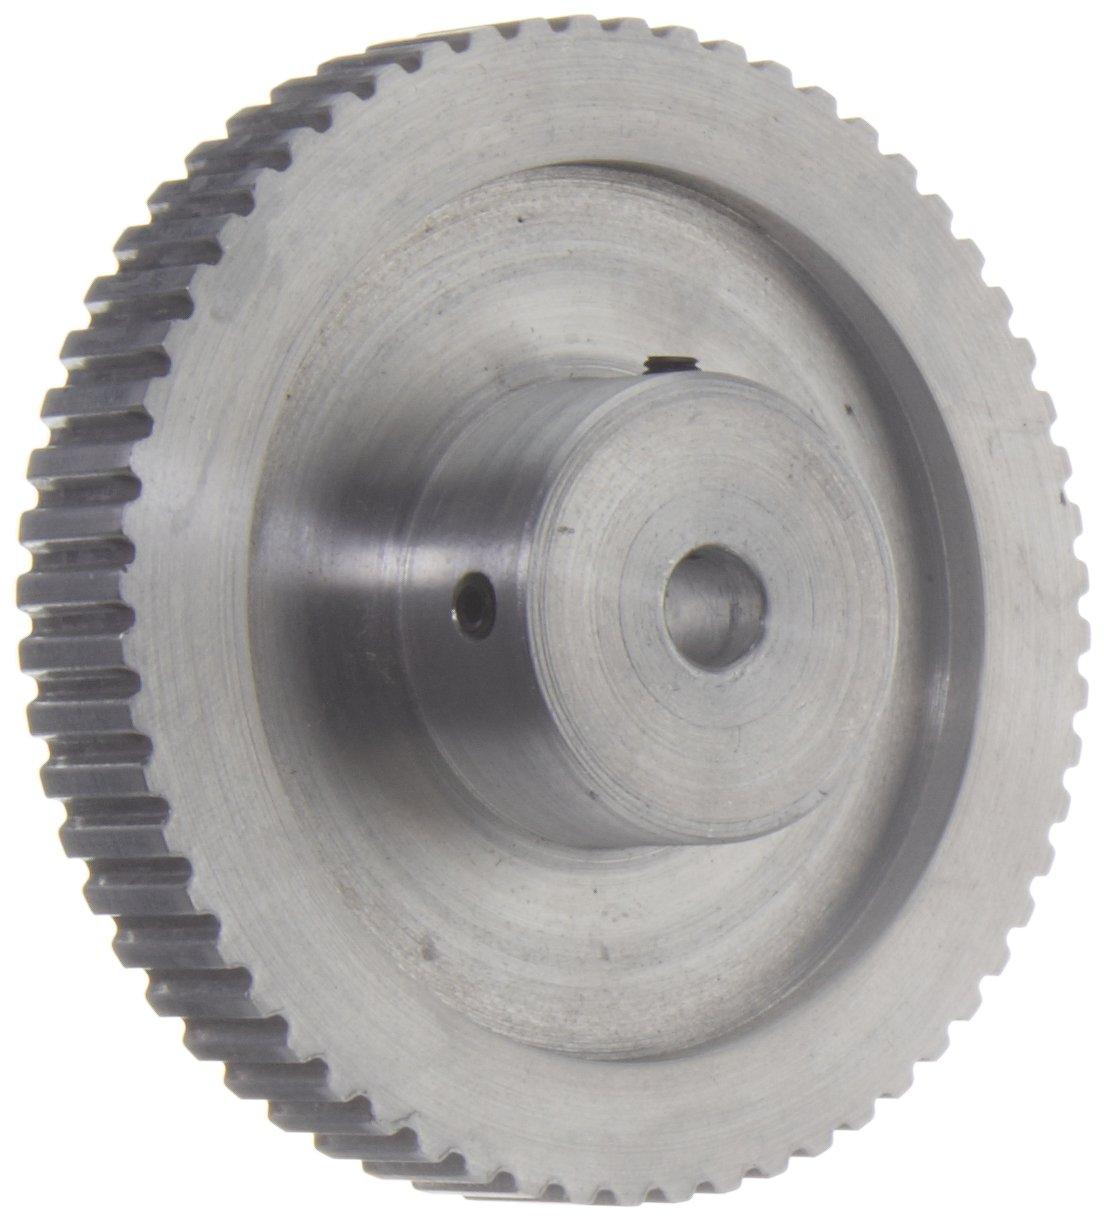 Gates PB60XL037 PowerGrip Aluminum Timing Pulley, 1/5